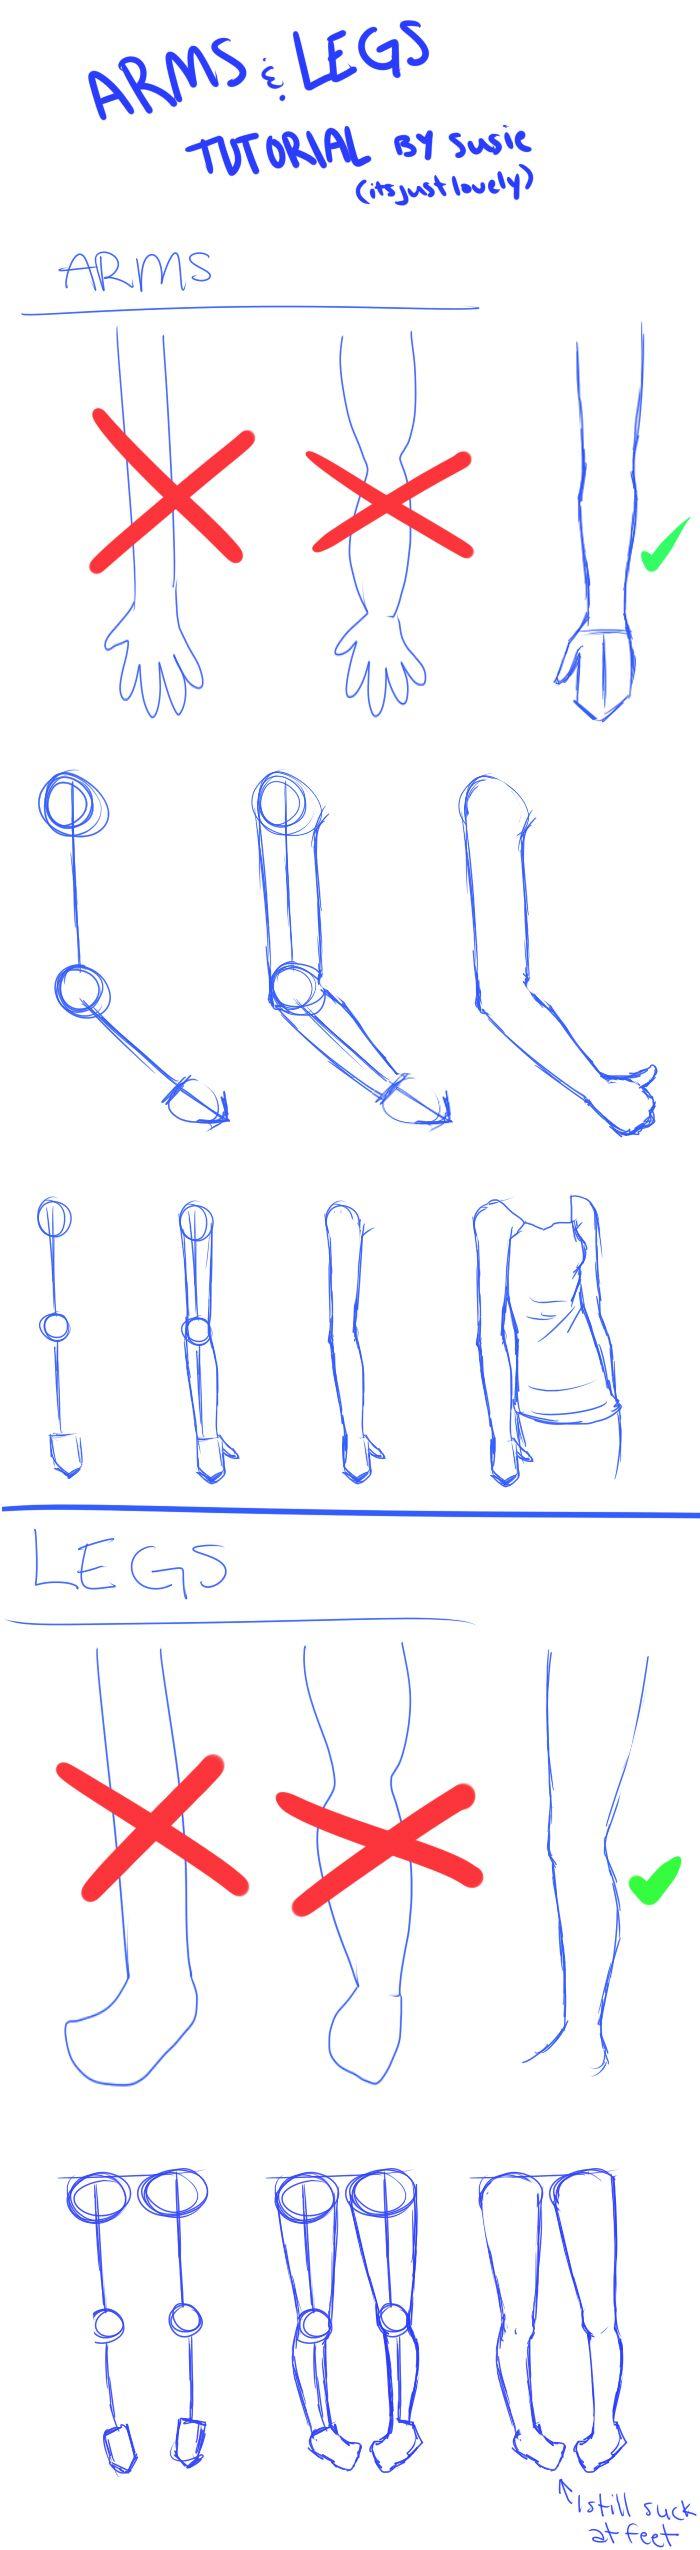 ARMS n' LEGS Tutorial by ItsJustLovely.deviantart.com on @DeviantArt